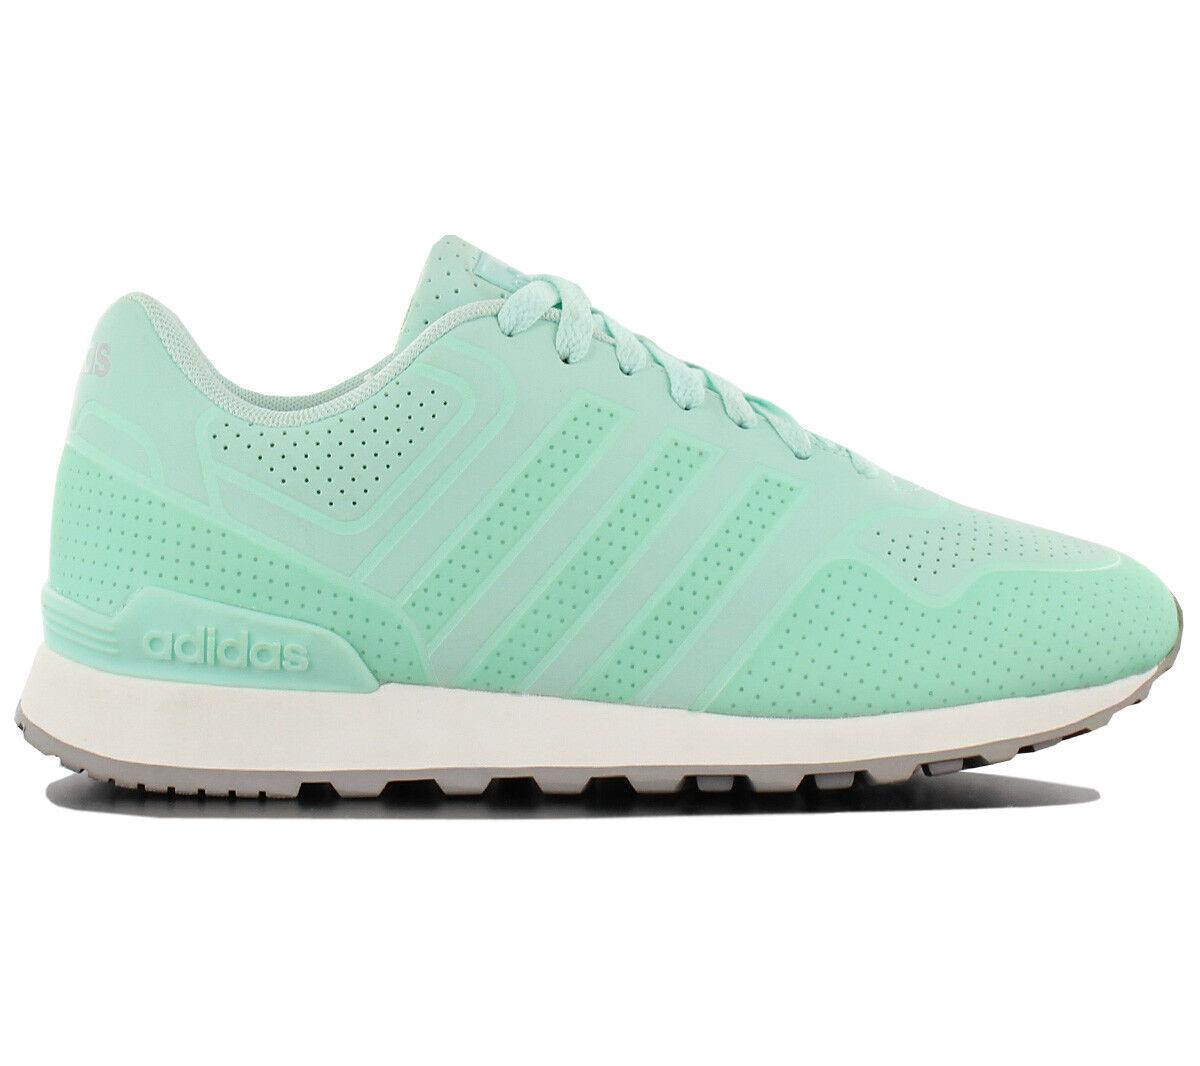 Adidas 10K Casual W Verde-Menta Sneaker Donna Moda Scarpe Verde-Menta W da Ginnastica AW5178 b5fd9d